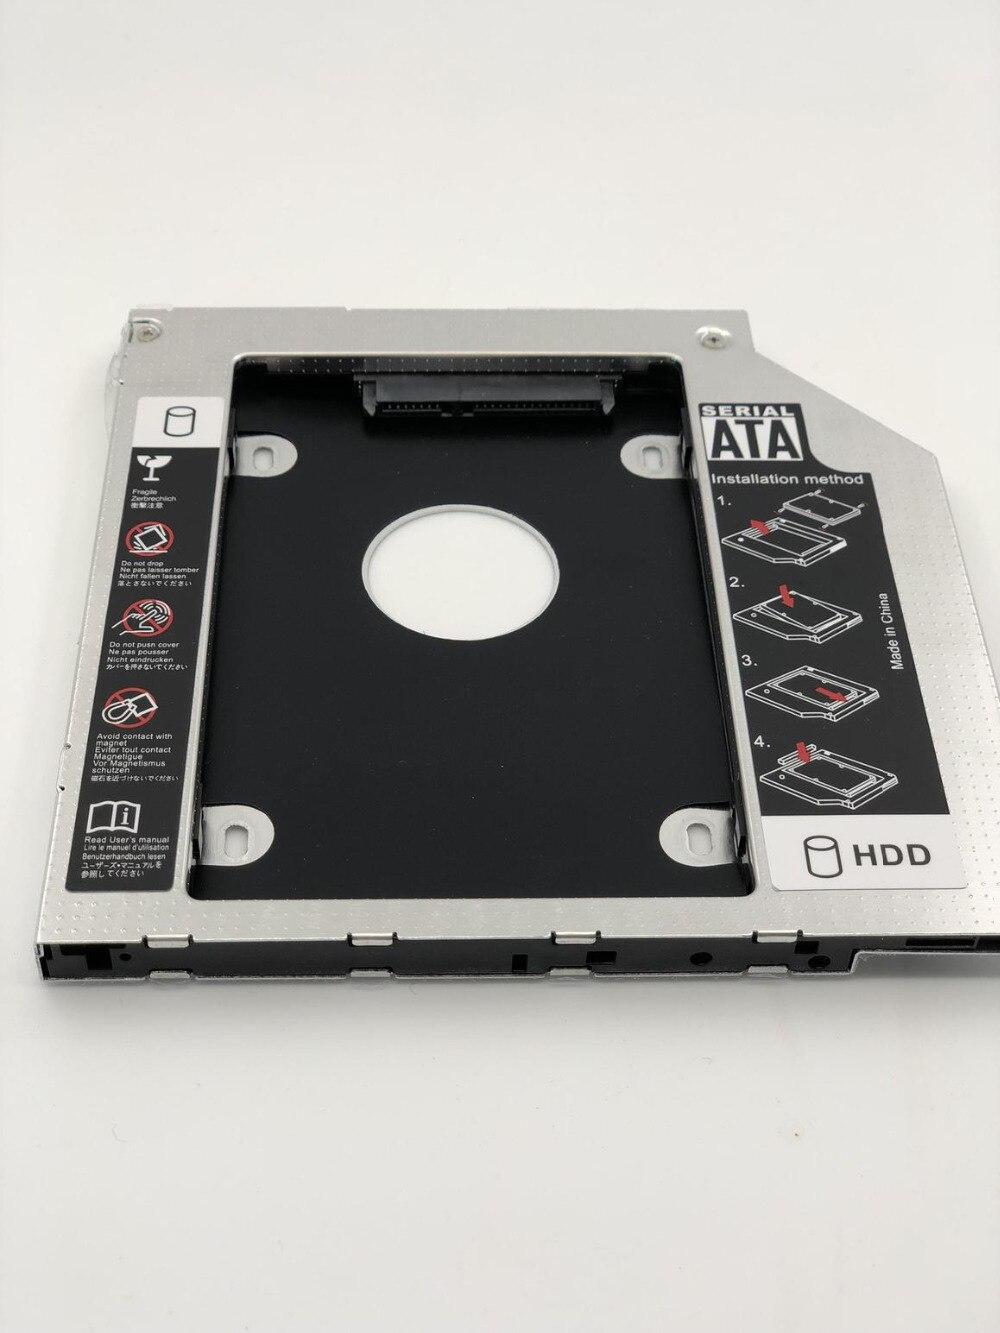 WZSM Новый 2nd SATA HDD SSD жесткий диск Caddy 9,5 мм для lenovo IdeaPad 110-15 ISK/ACL /ИБР/IKB/Издательство АСТ